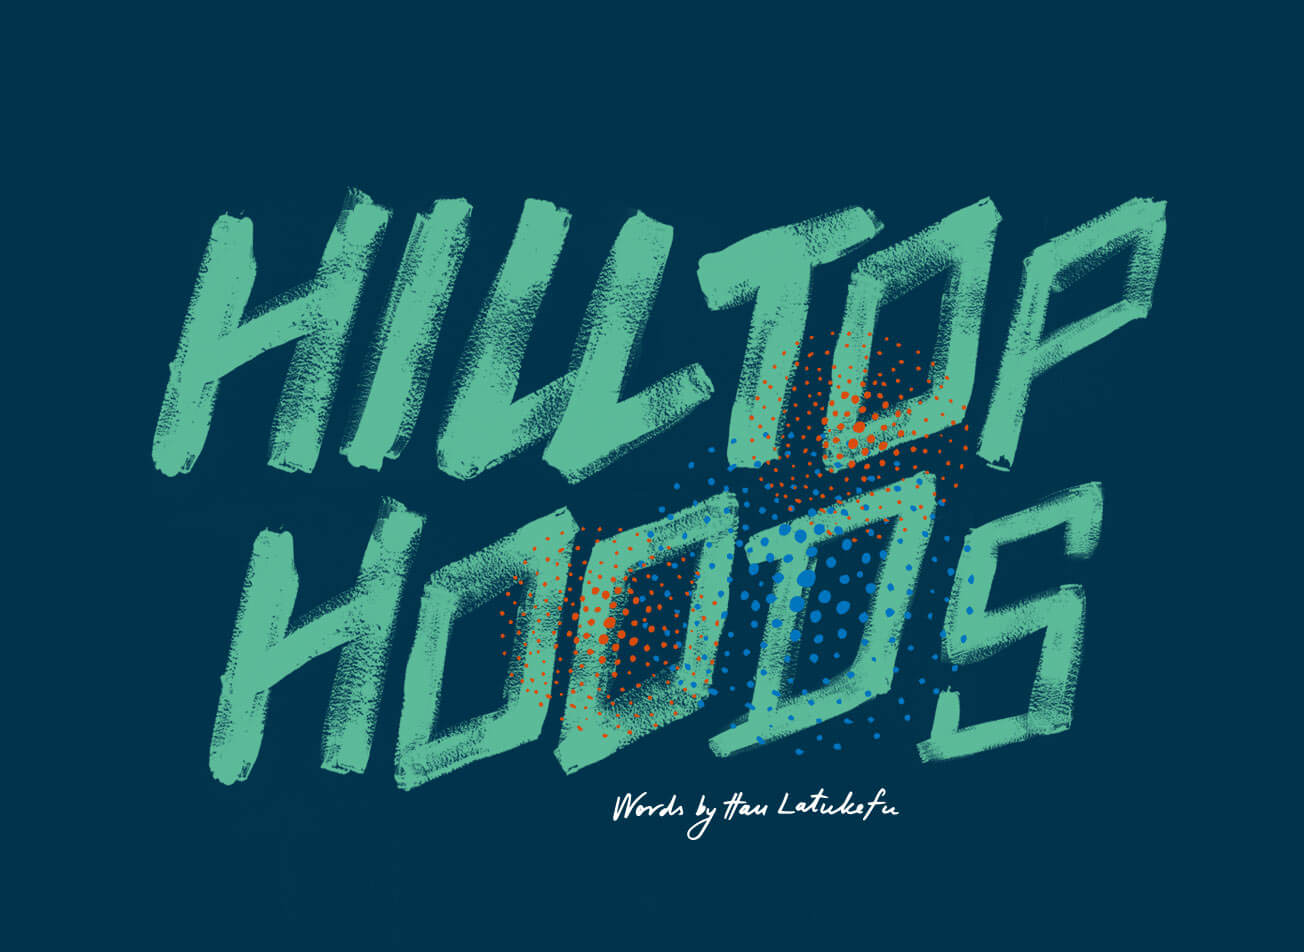 NatCarroll_triplej_Annual_2014_Lettering_HilltopHoods_7col